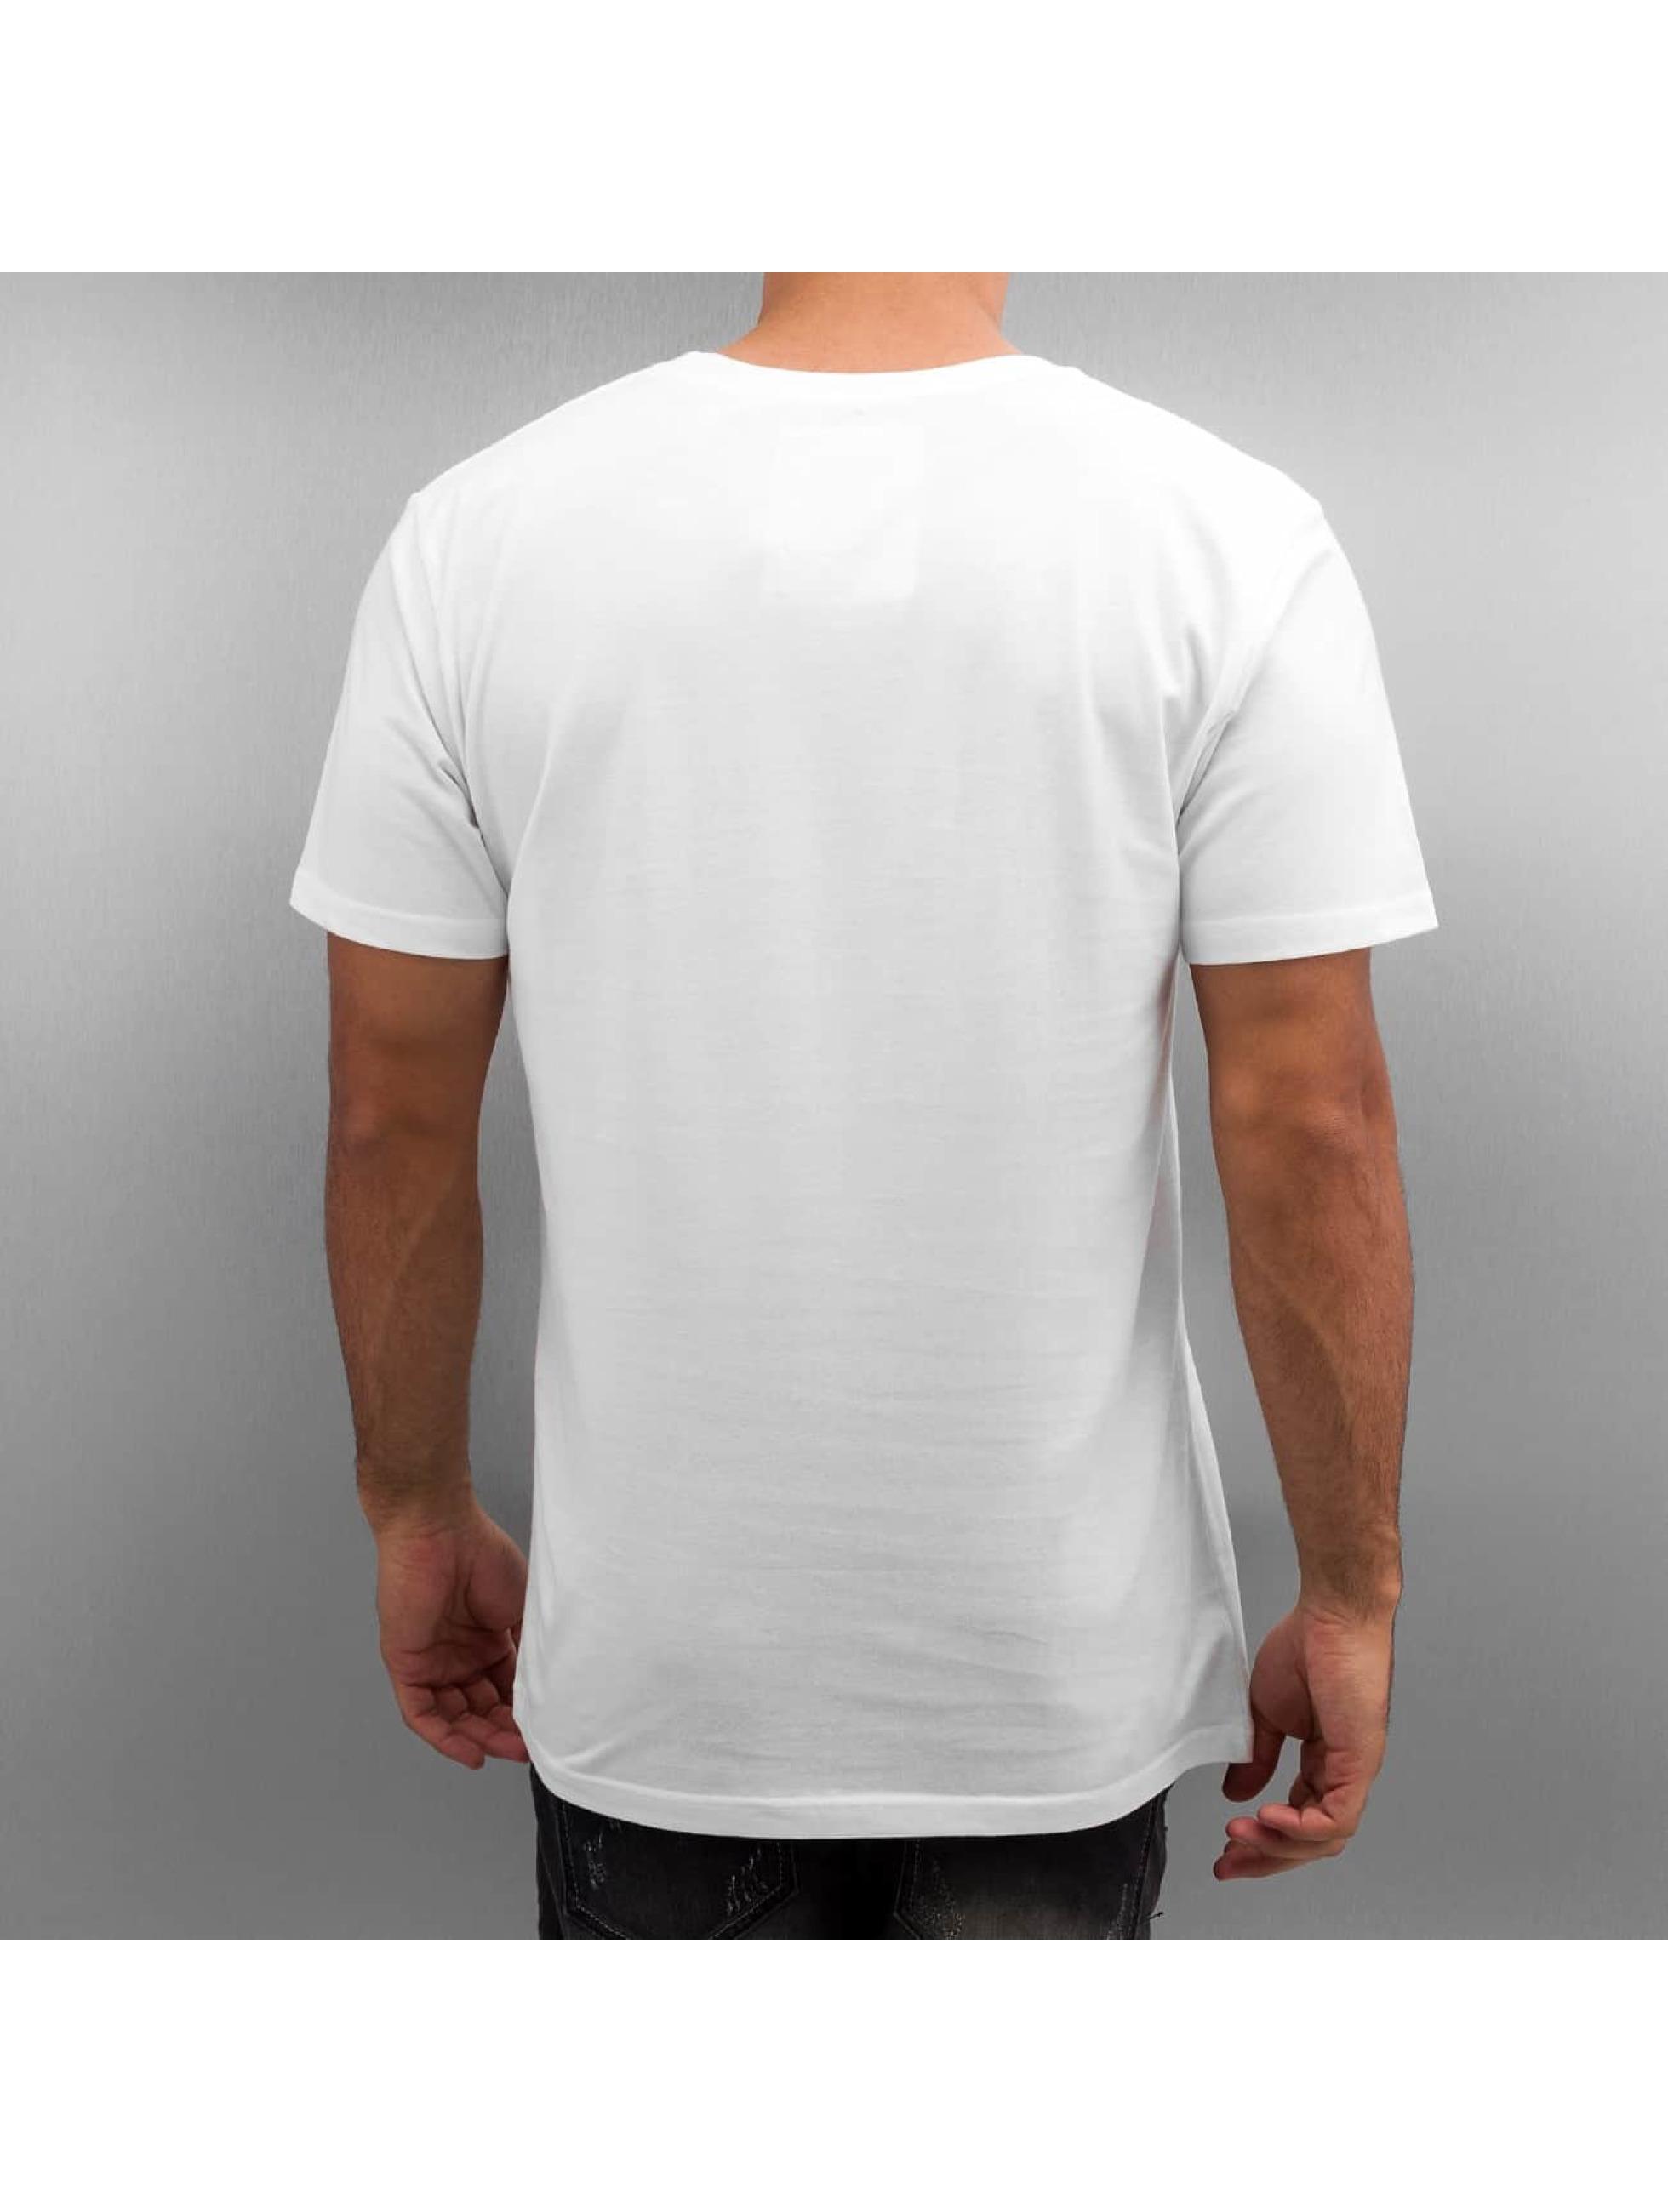 DEDICATED t-shirt Nicklas Johnson Record Head wit